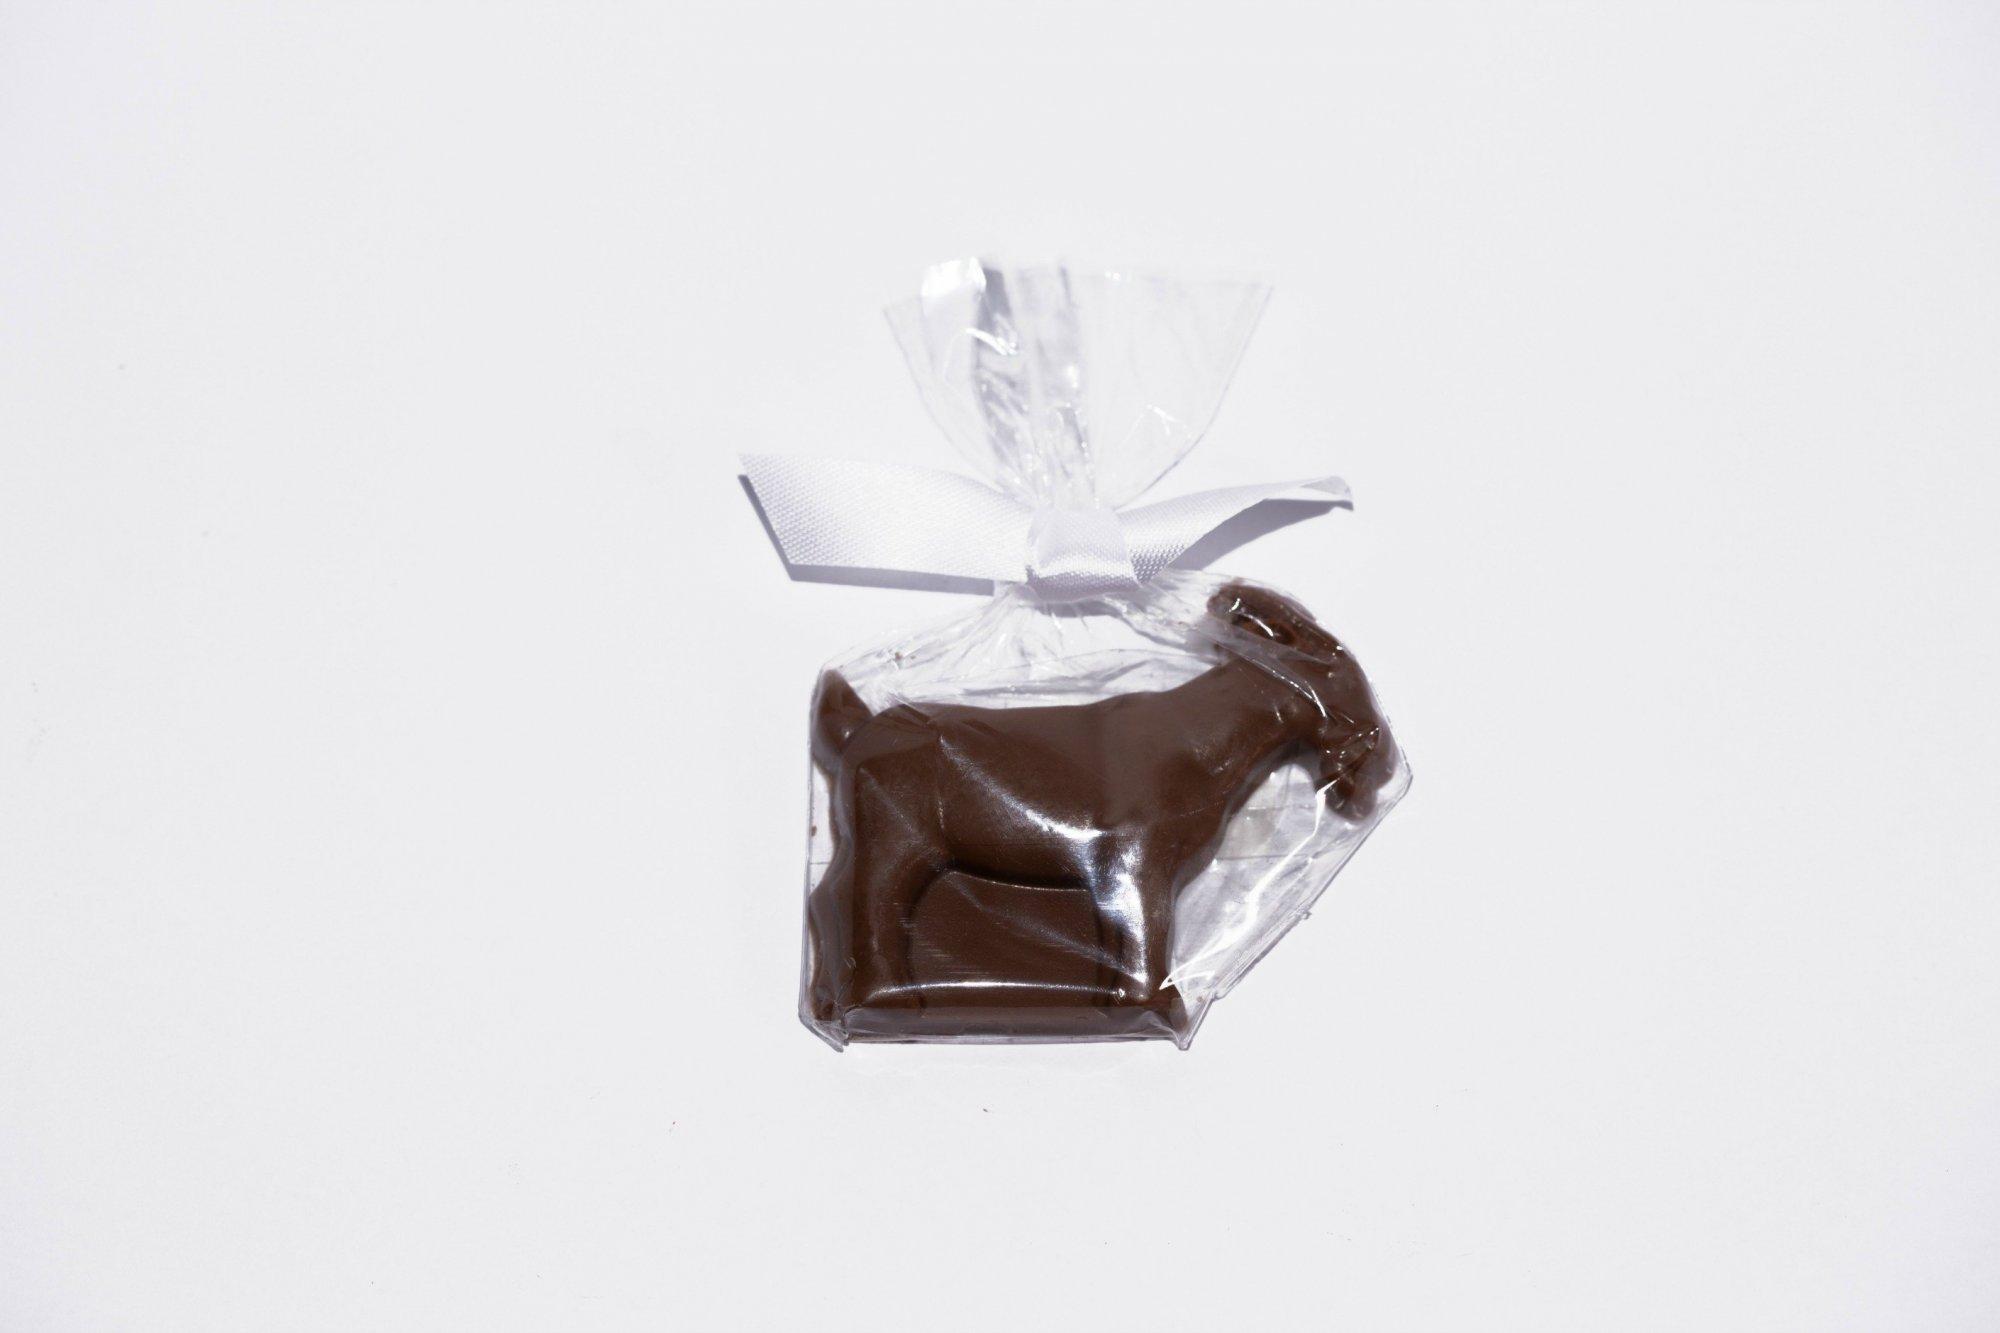 The little kid - 1oz dark chocolate goat